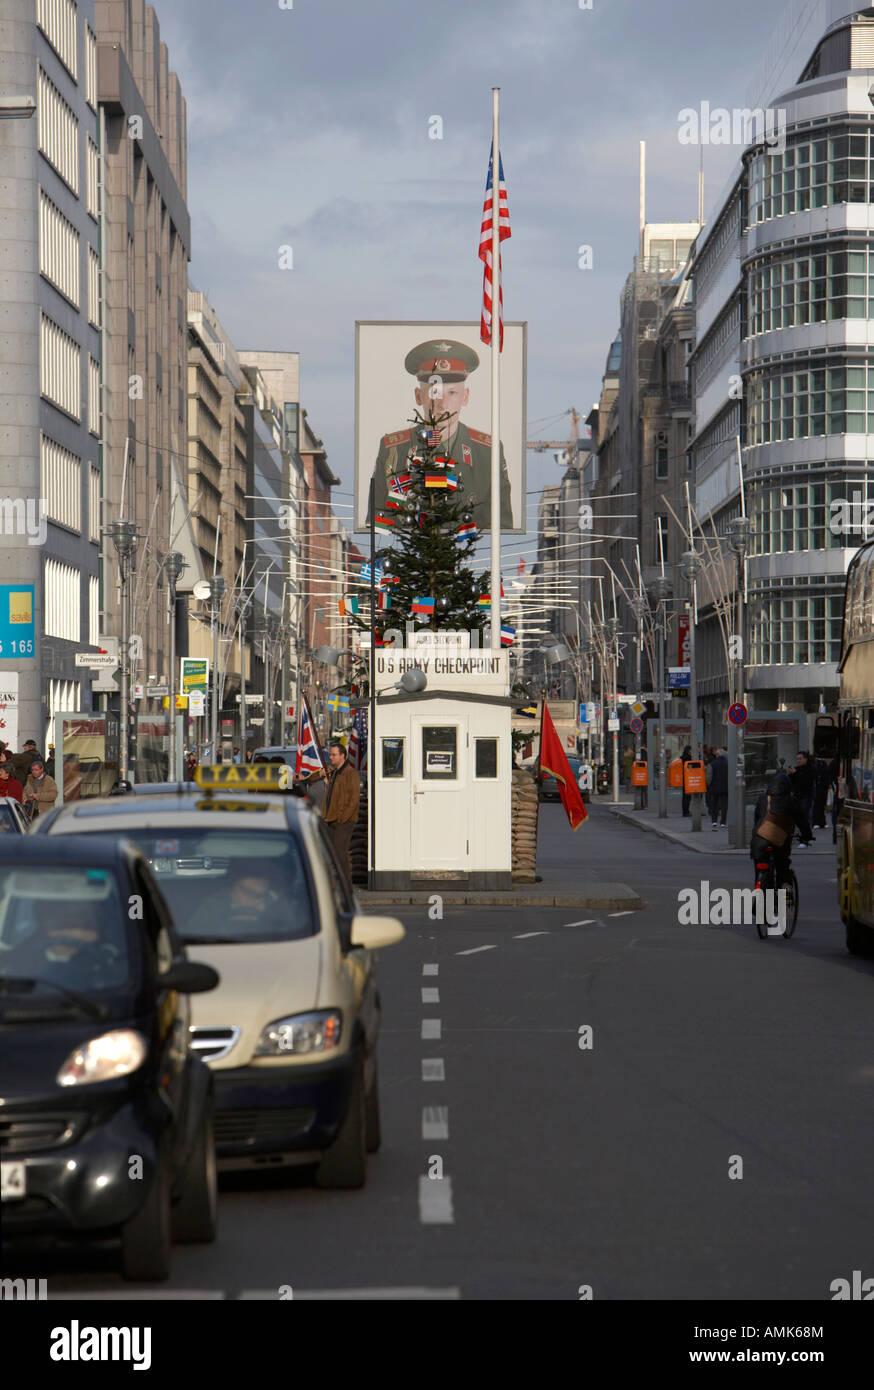 Checkpoint Charlie ersatz cabin reconstrucción en medio de la calle Friedrichstraße Berlín ALEMANIA Imagen De Stock